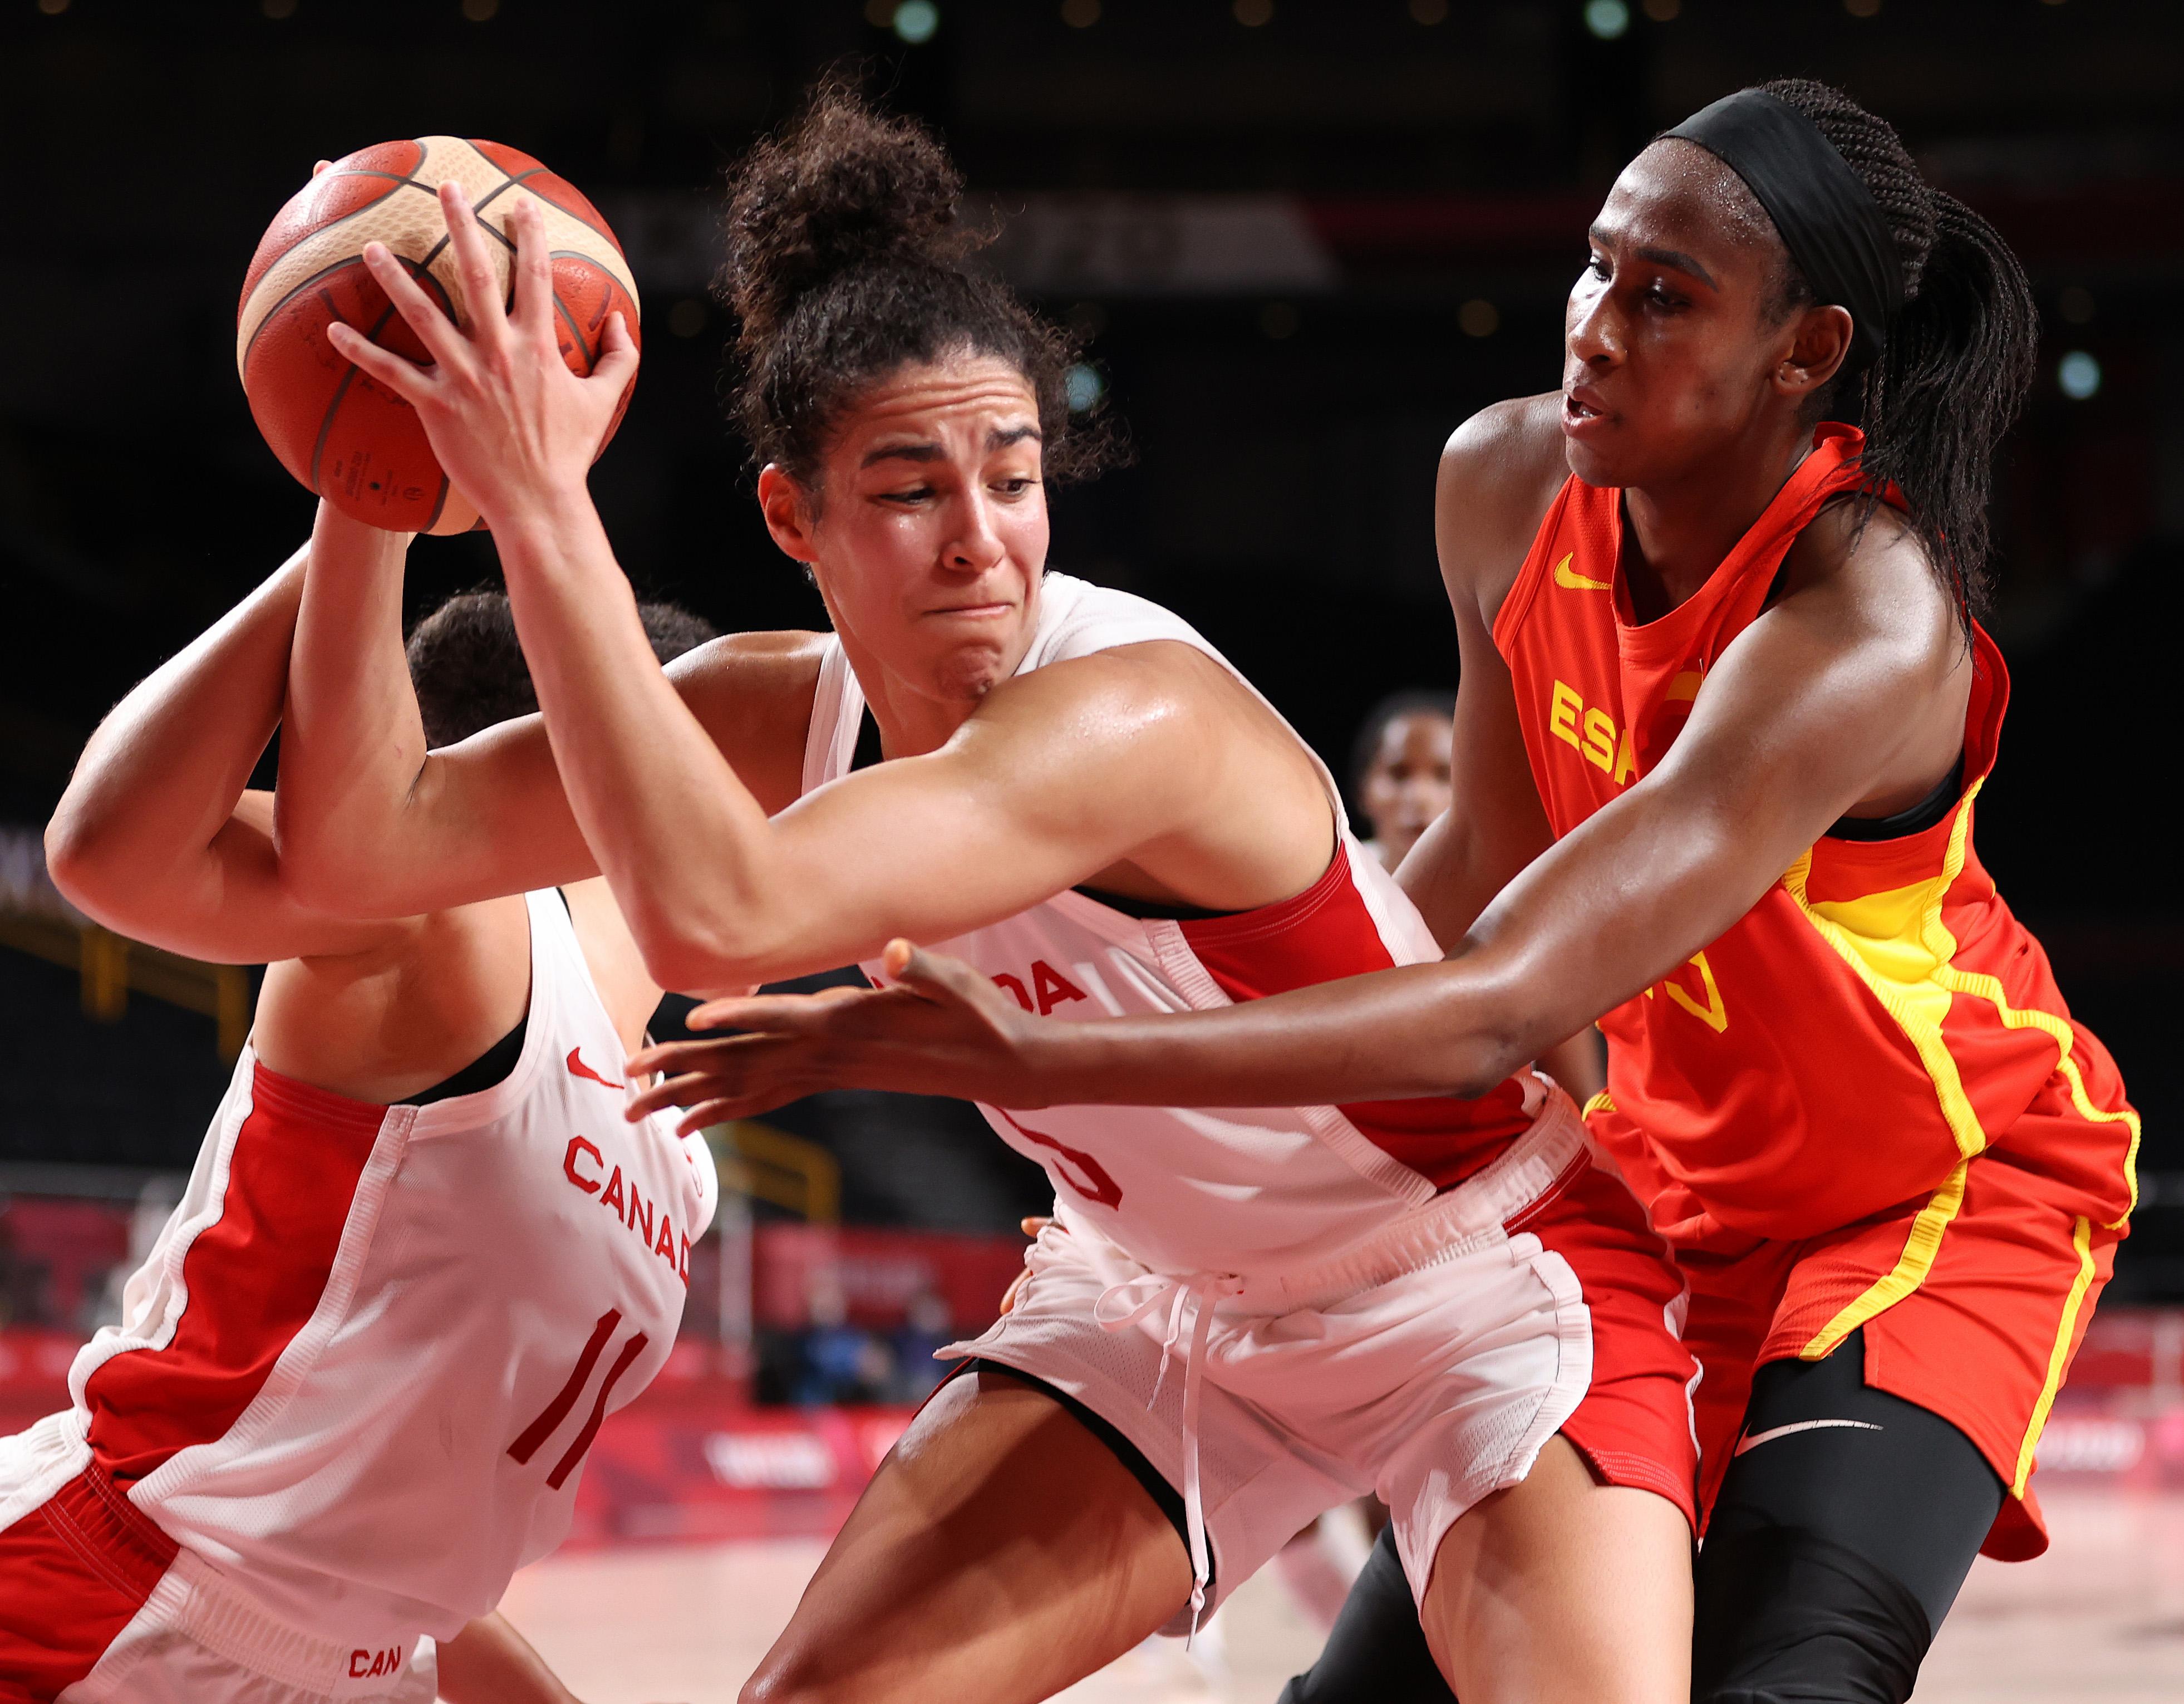 Canada v Spain Women's Basketball - Olympics: Day 9